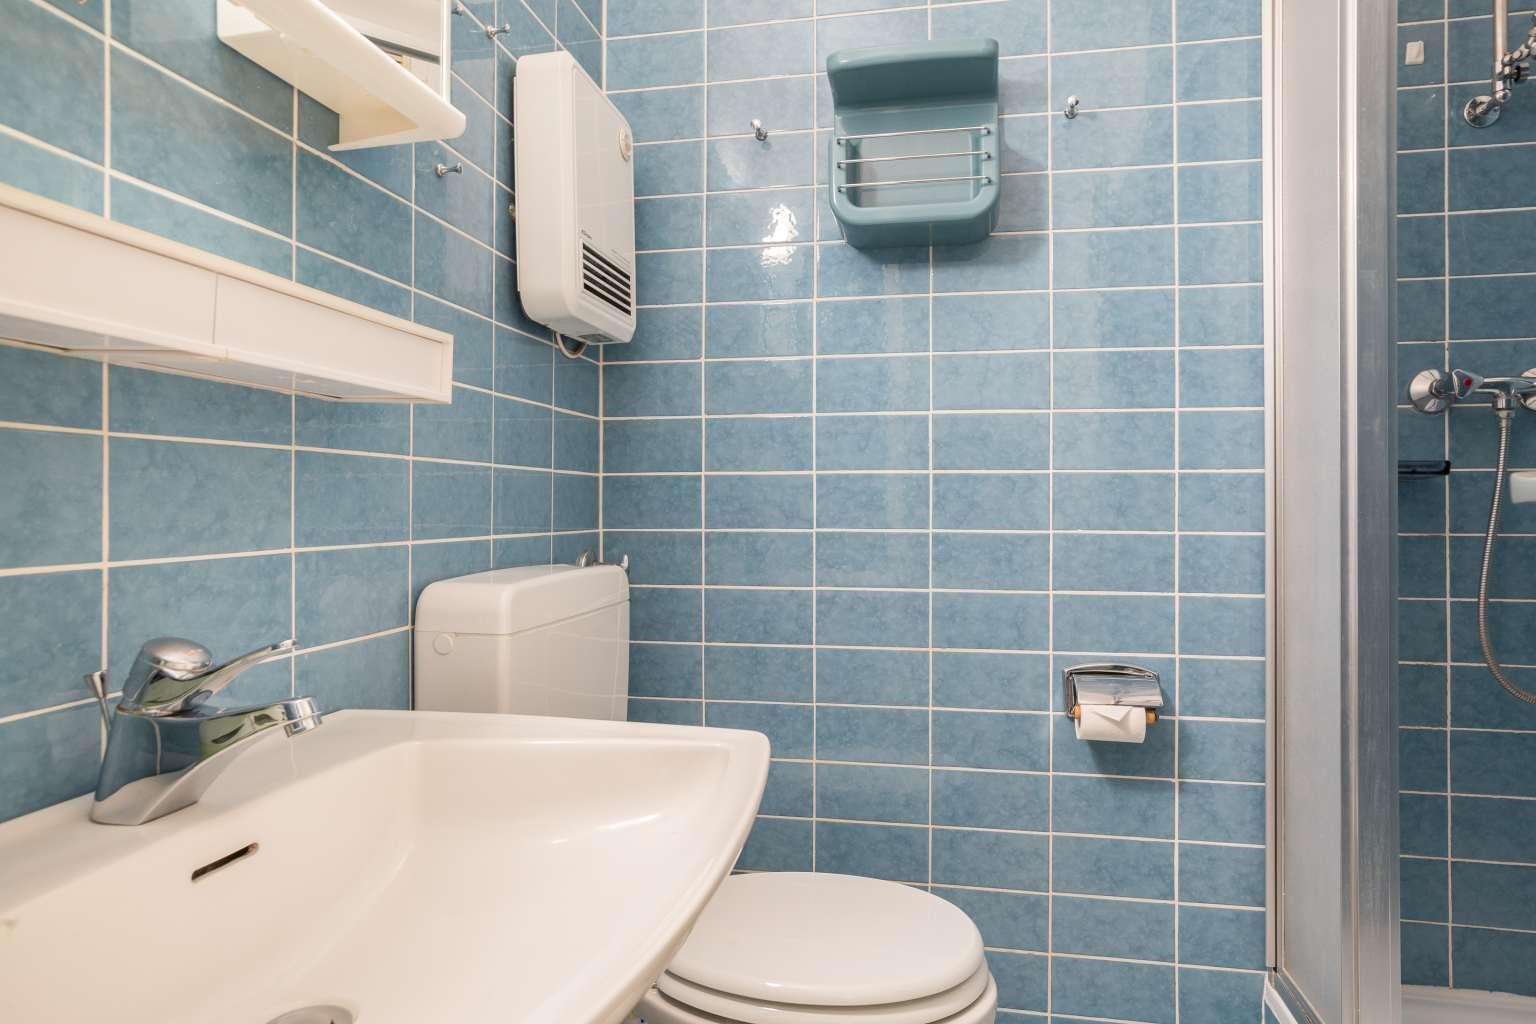 Badezimmer, Ferienwohnung Nr. 80, St Peter Ording Bad, Haus Atlantic,  Alter Badweg 11-15